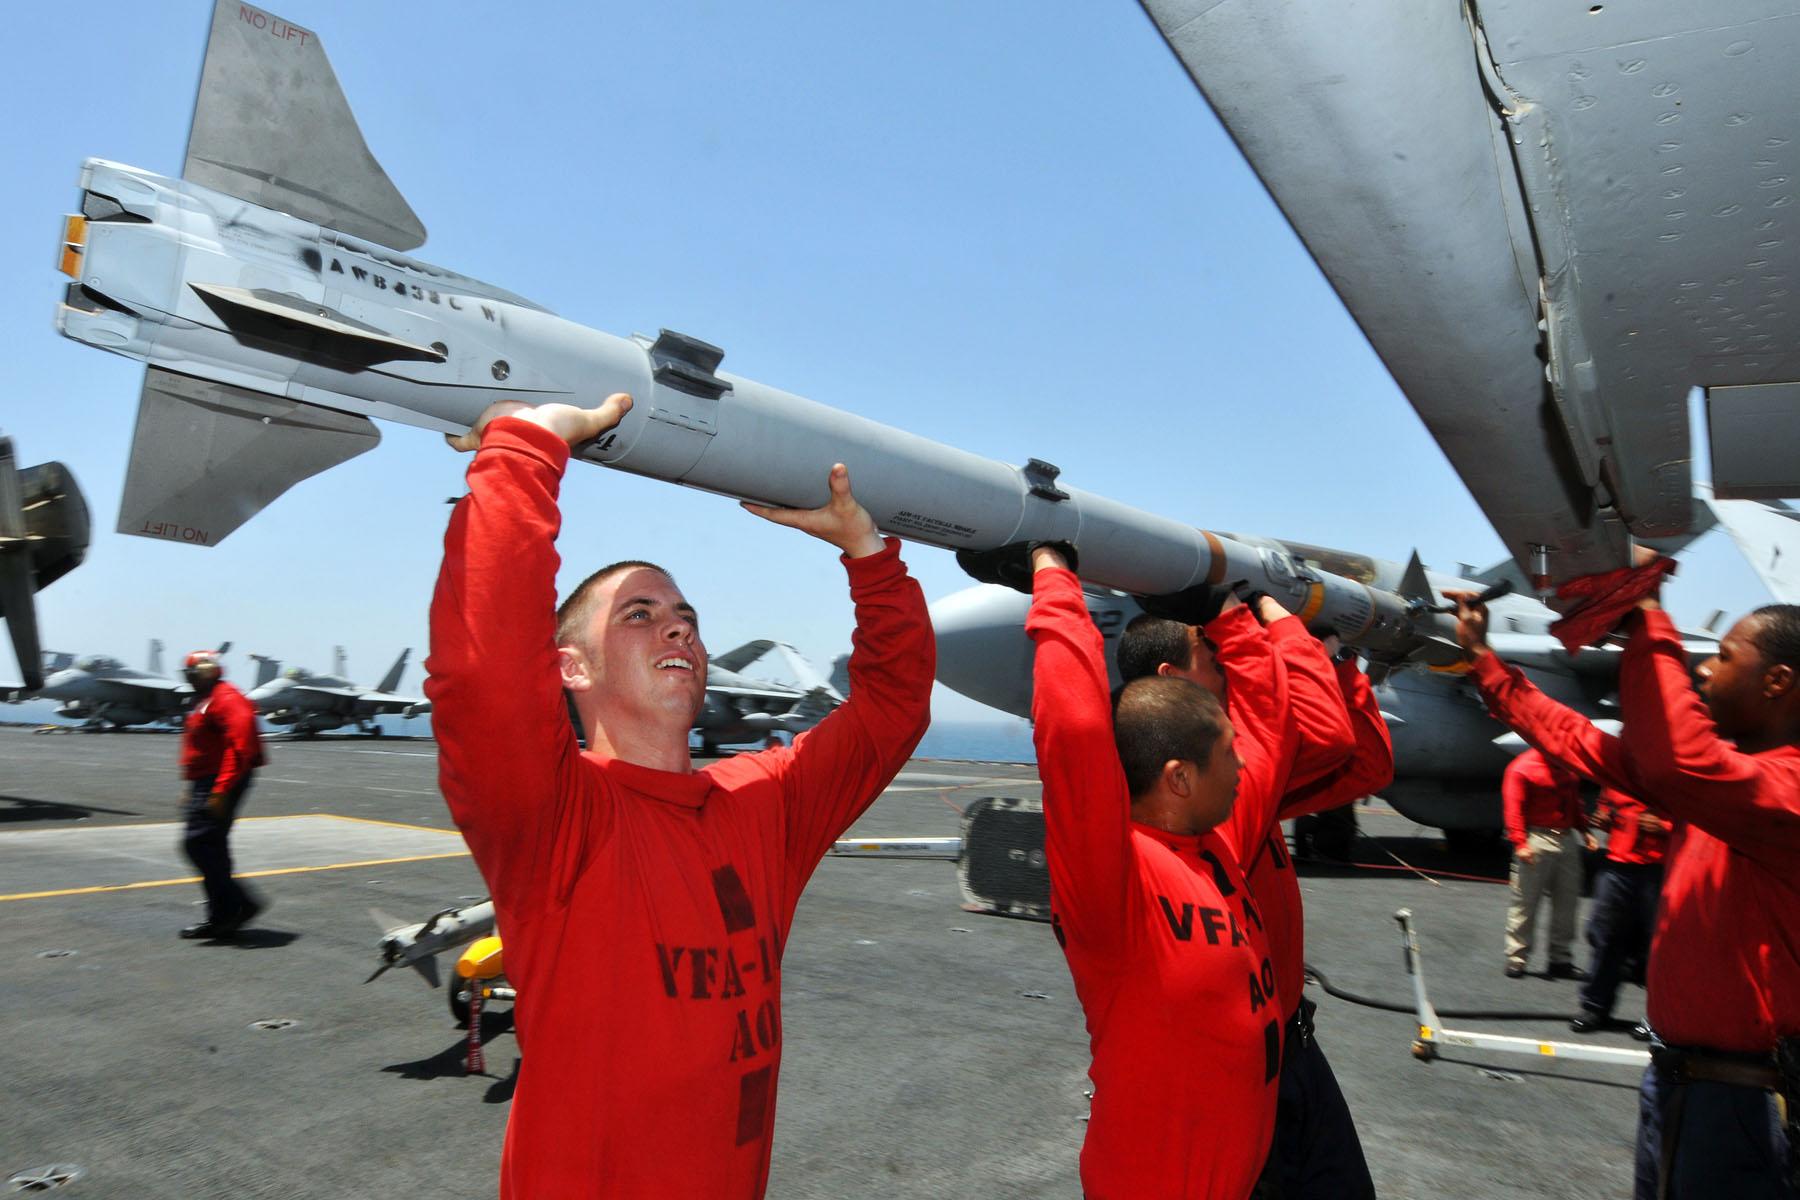 Global Federation National News Network! US_Navy_110520-N-1004S-449_Sailors_attach_an_Aim-9x_Sidewinder_missile_to_an_F-A-18C_Hornet_aboard_the_aircraft_carrier_Ronald_Reagan_(CVN_76)